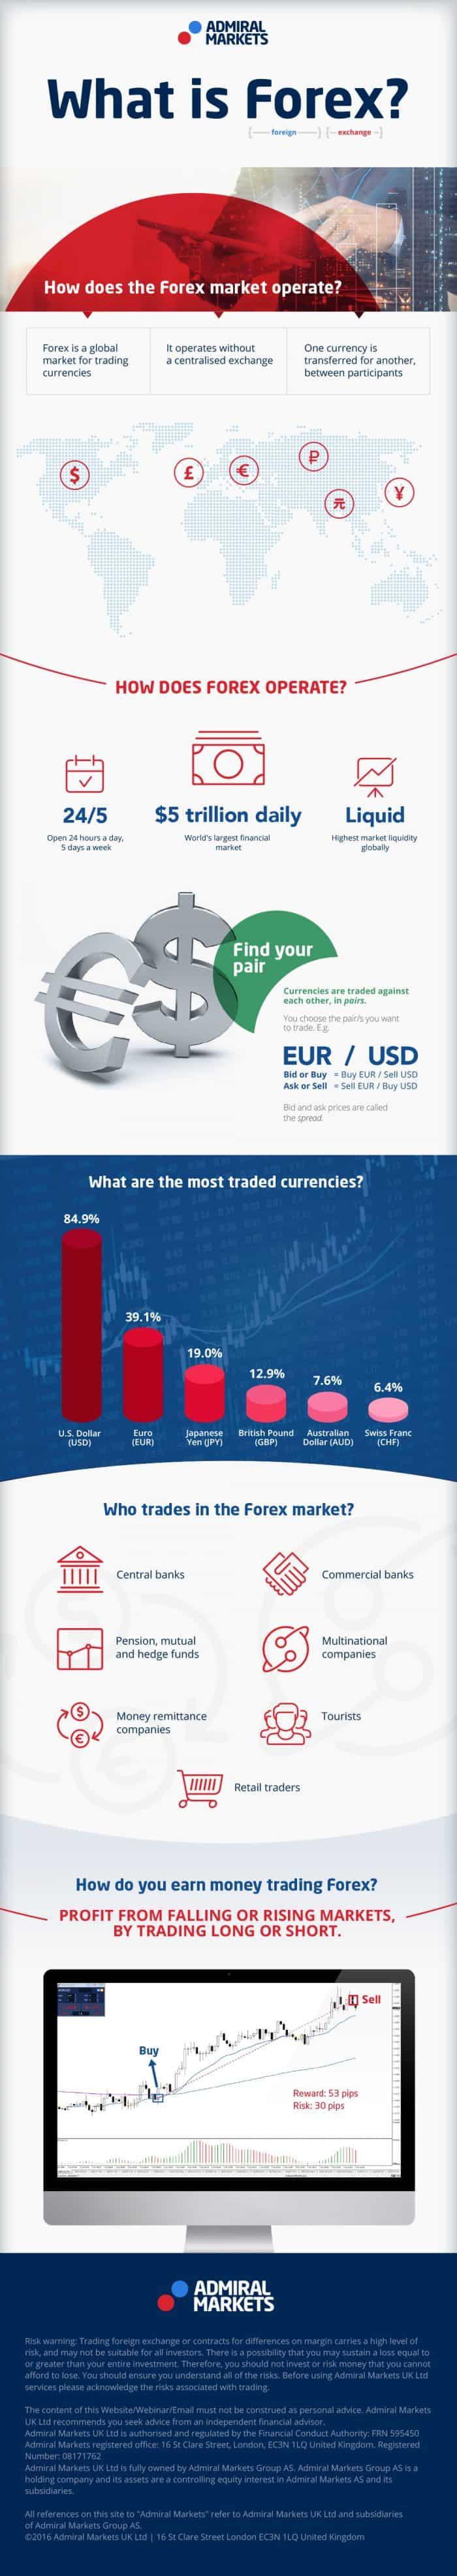 forex trading, strategi forex, broker forex, belajar forex